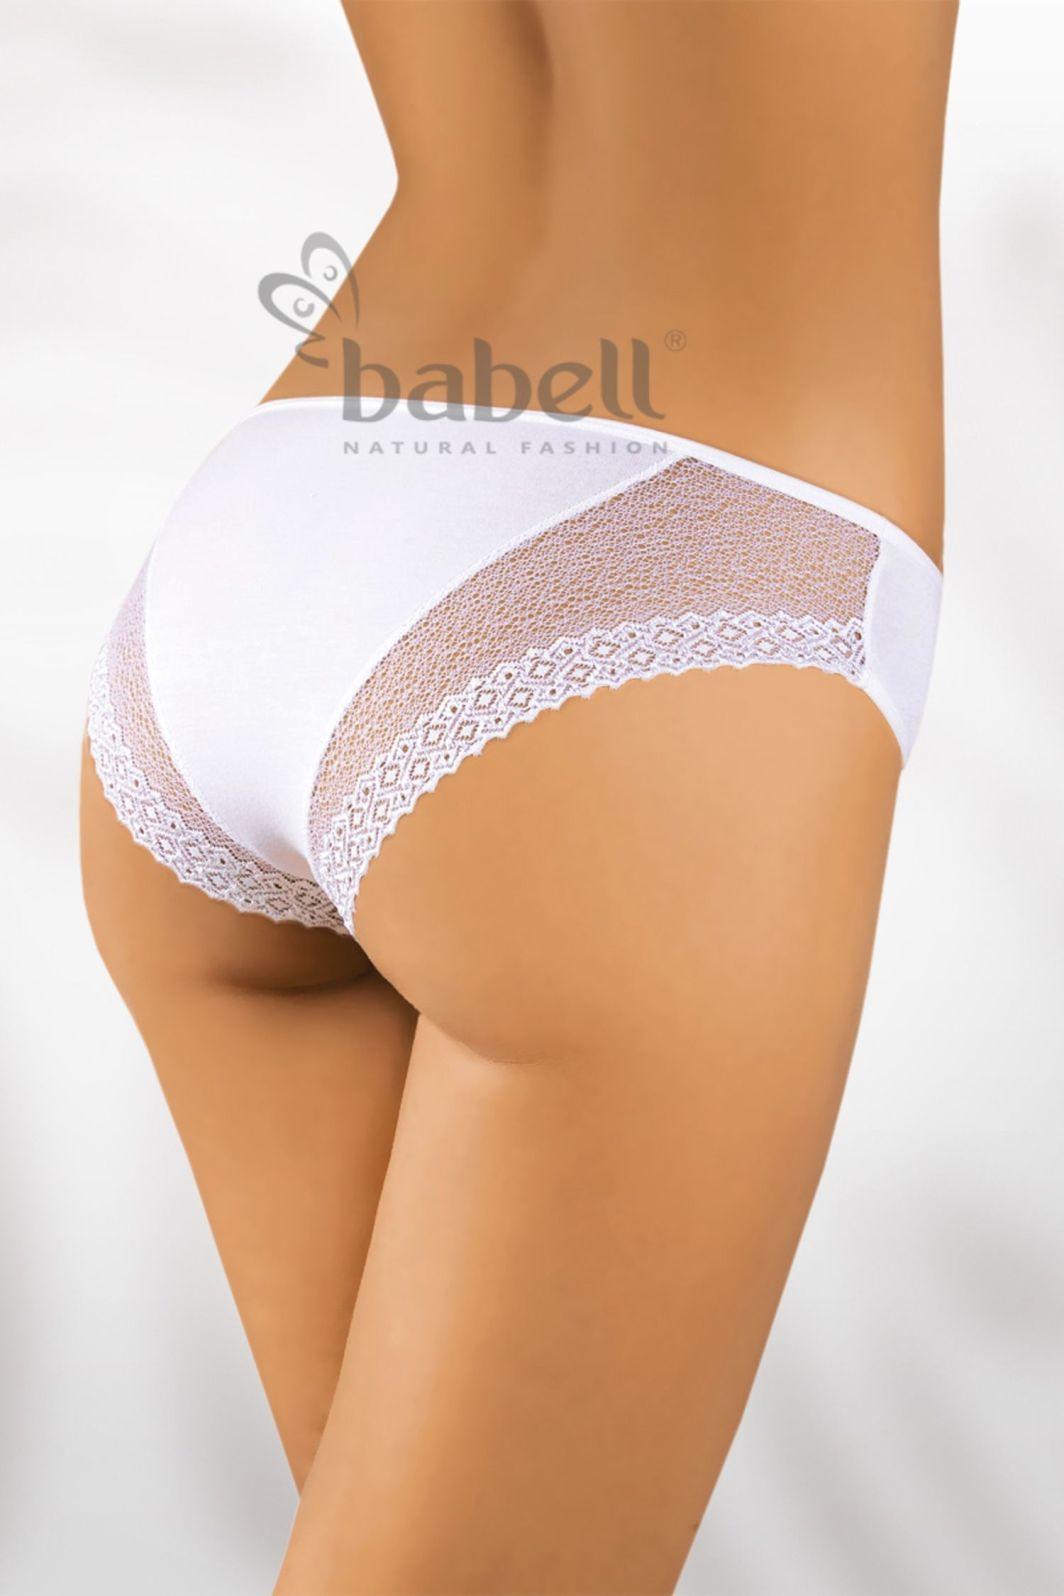 Babell Figi damskie BBL-012 białe r. L 1